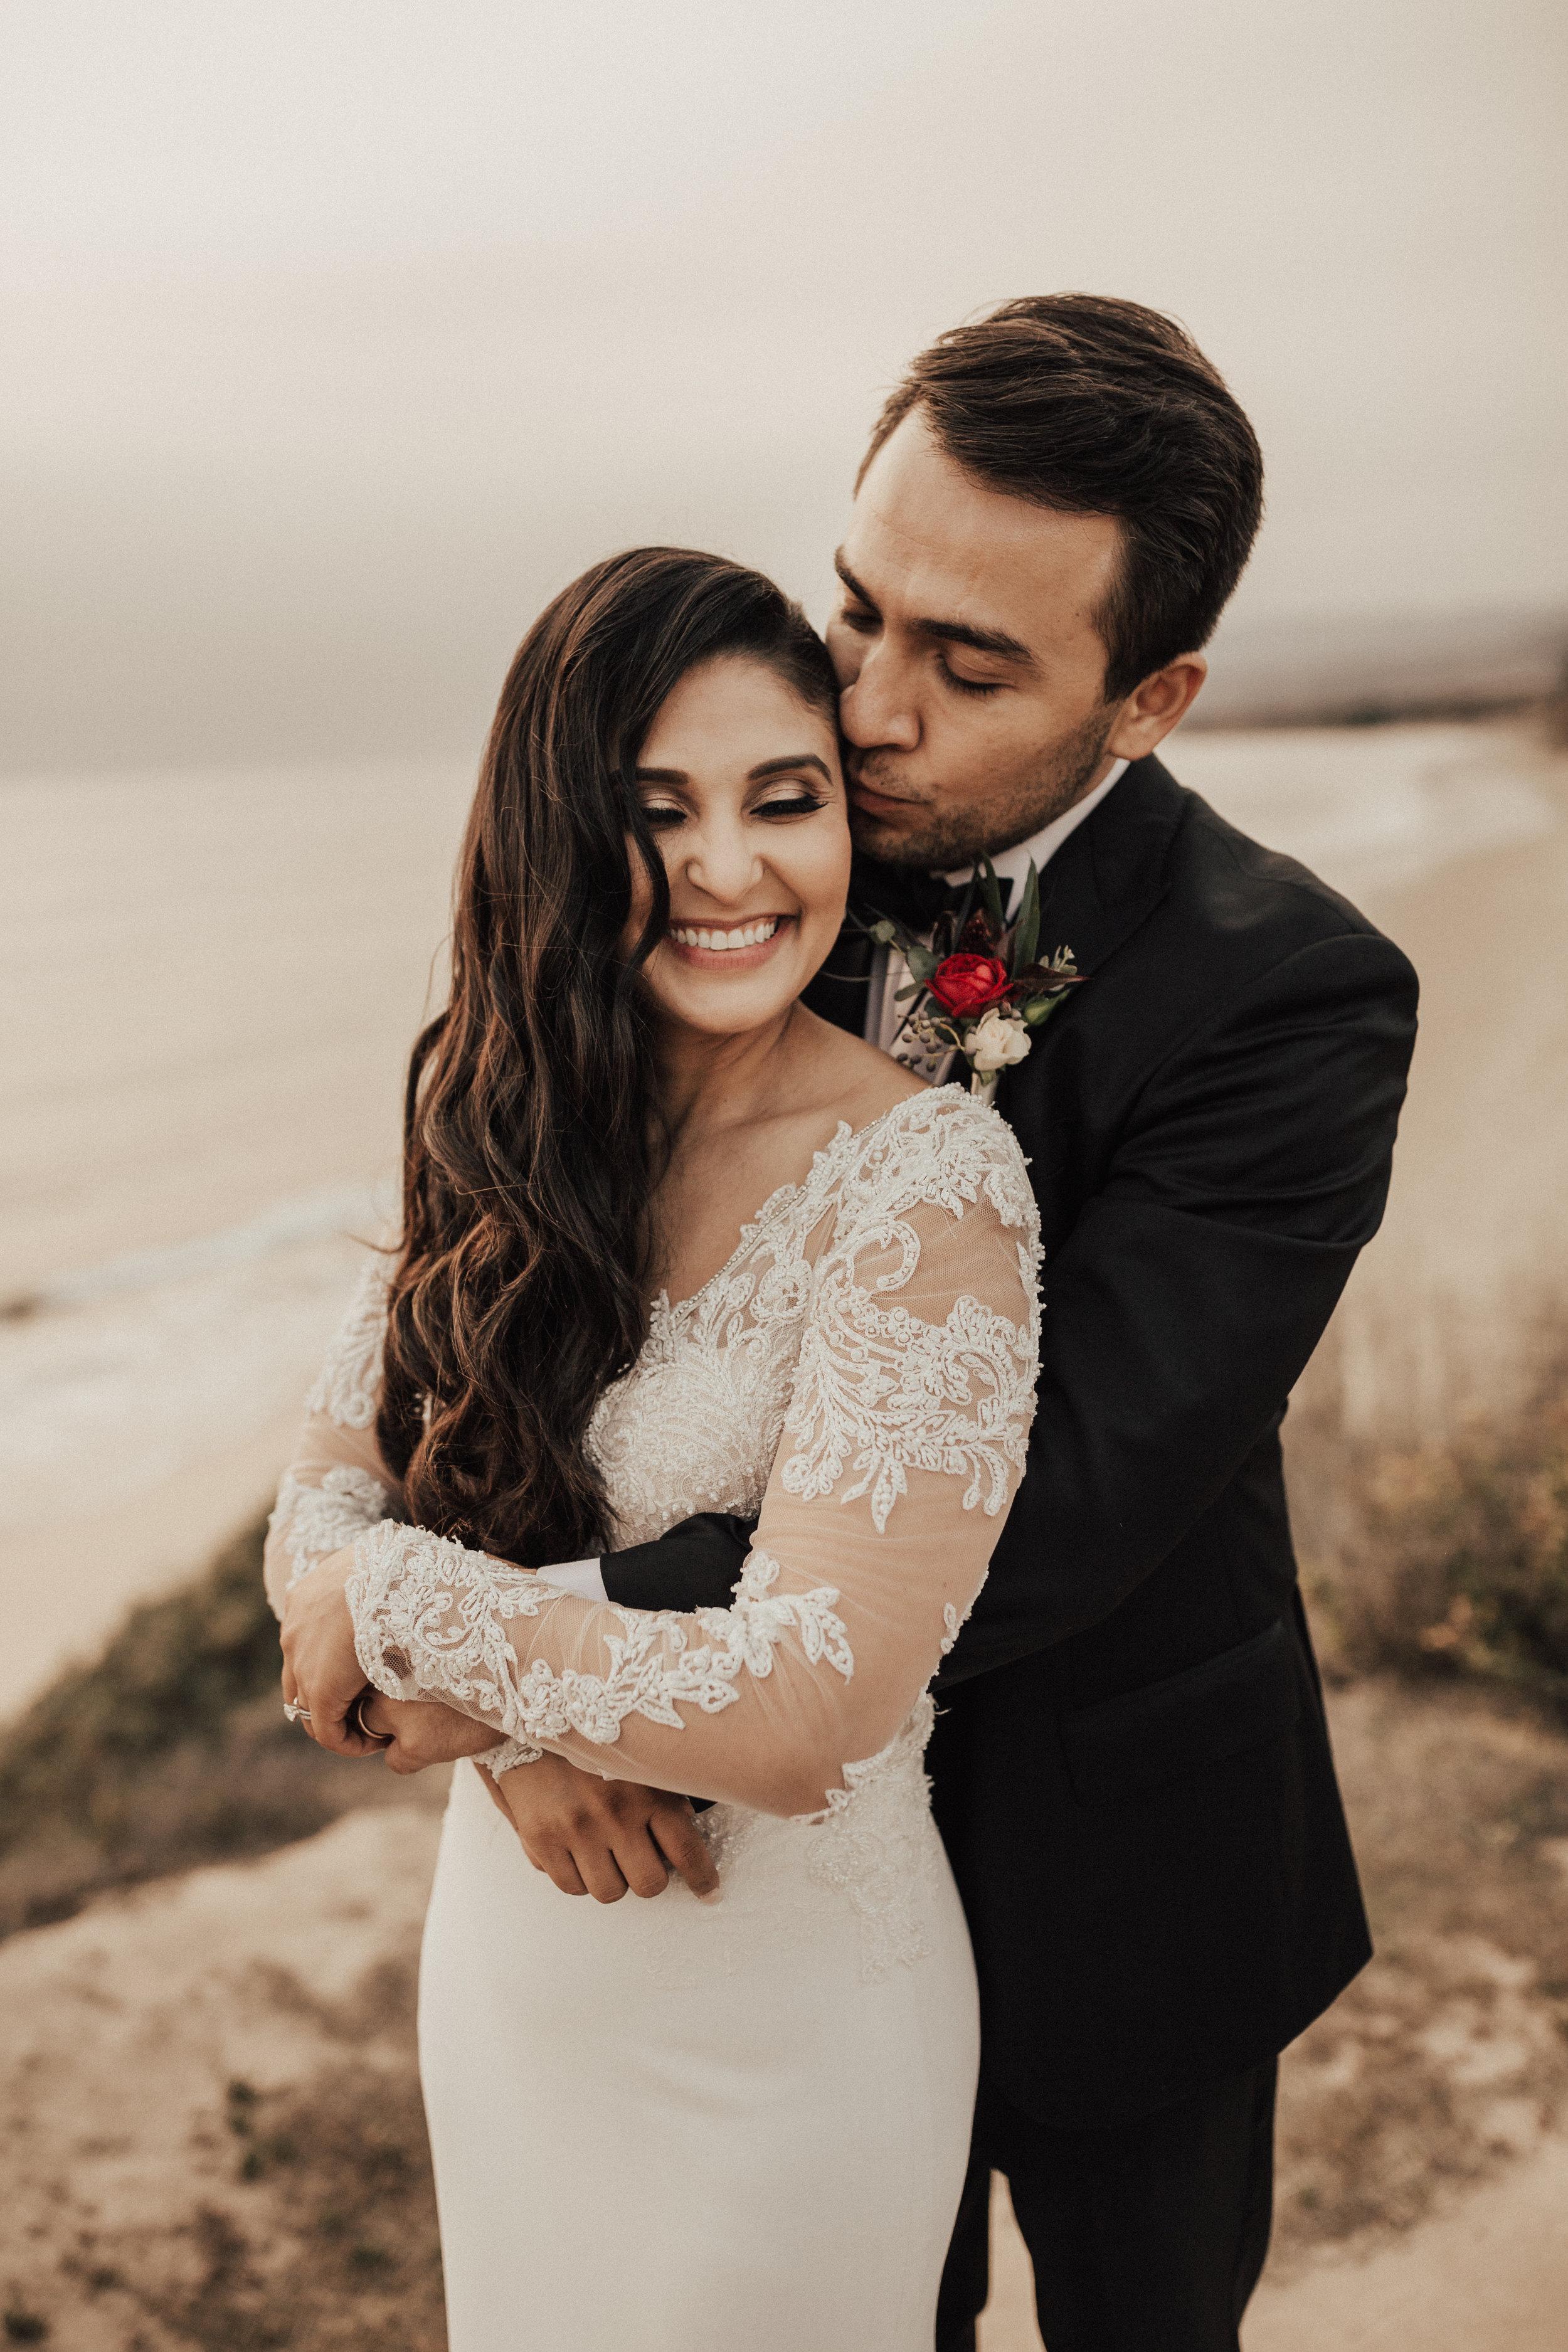 JessicaVictor-SantaBarbara-OrchidFarms-Wedding-600.jpg